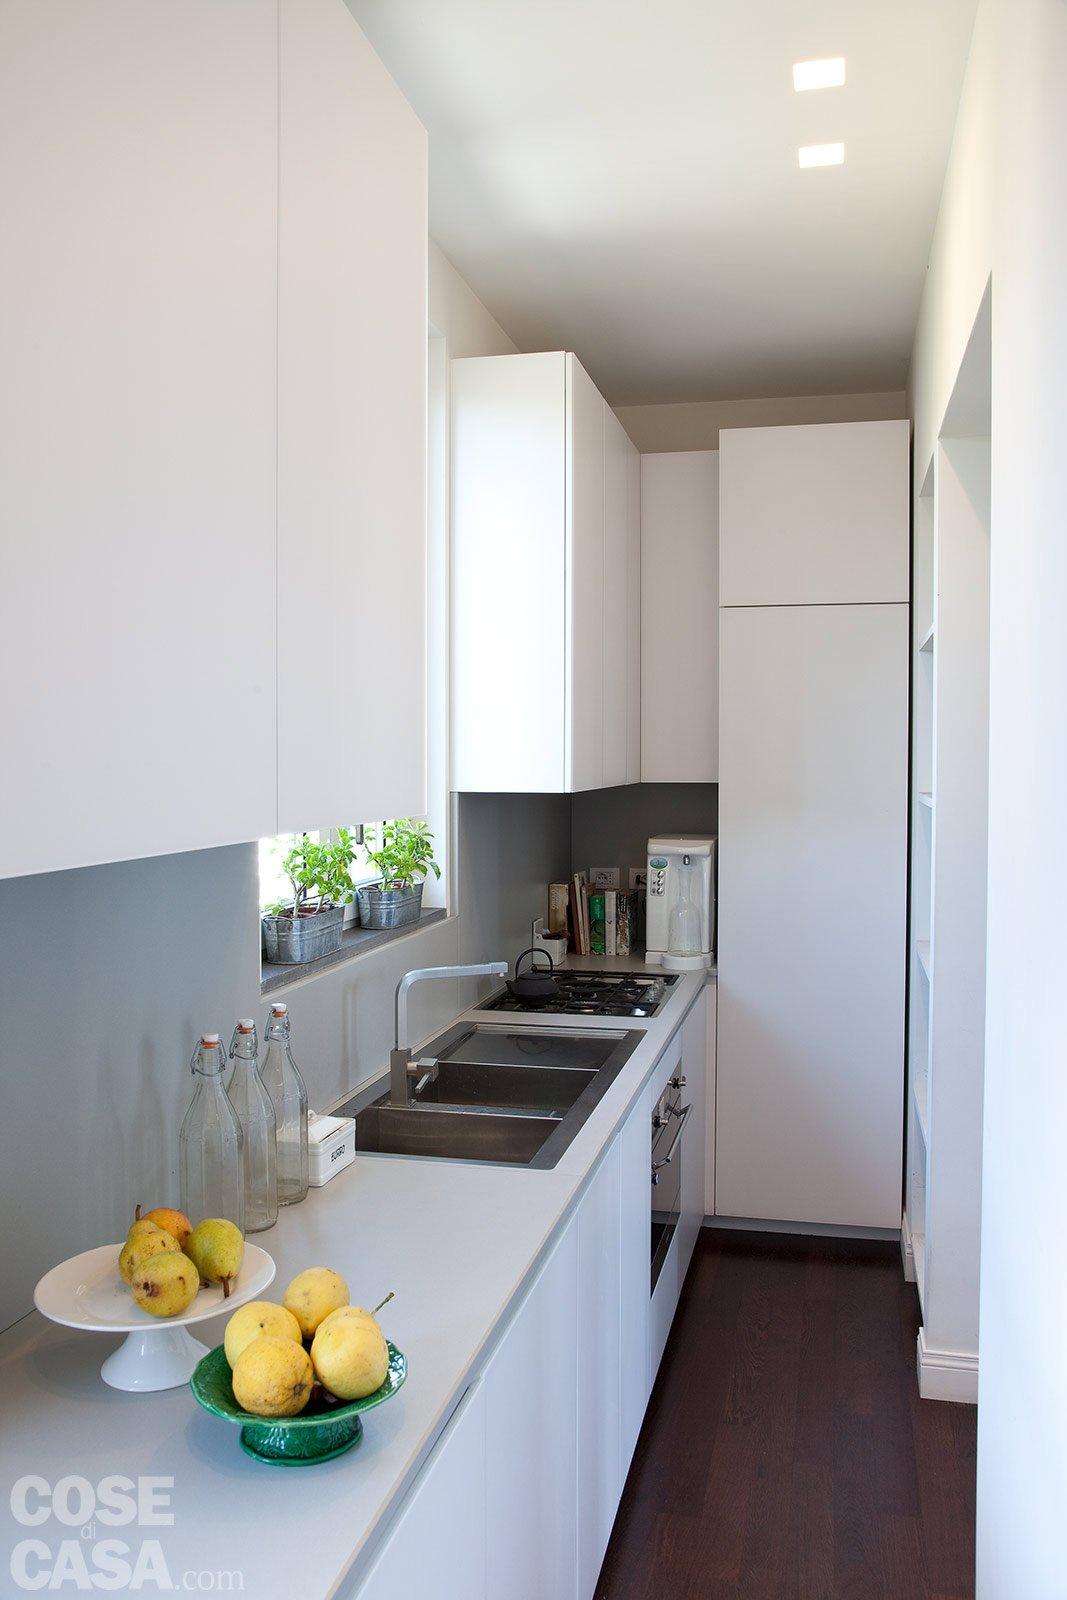 Cucine Moderne Piccole Ad Angolo. Latest Pin Dispensa Ad Angolo On ...